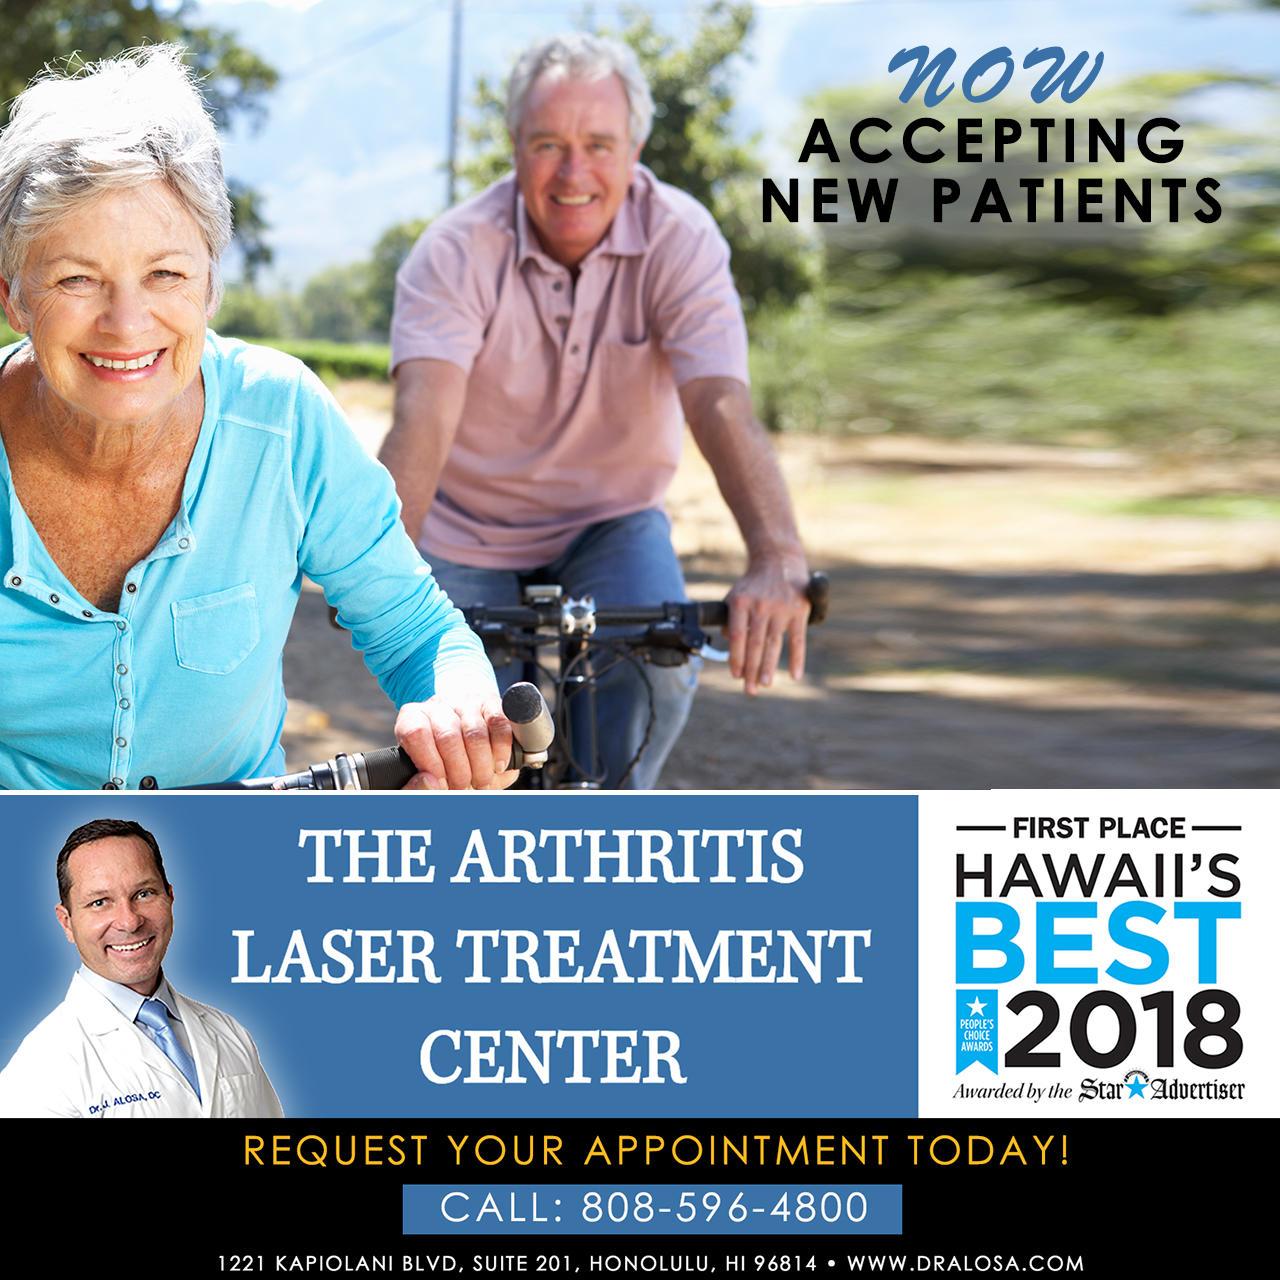 The Arthritis Laser Treatment Center image 2